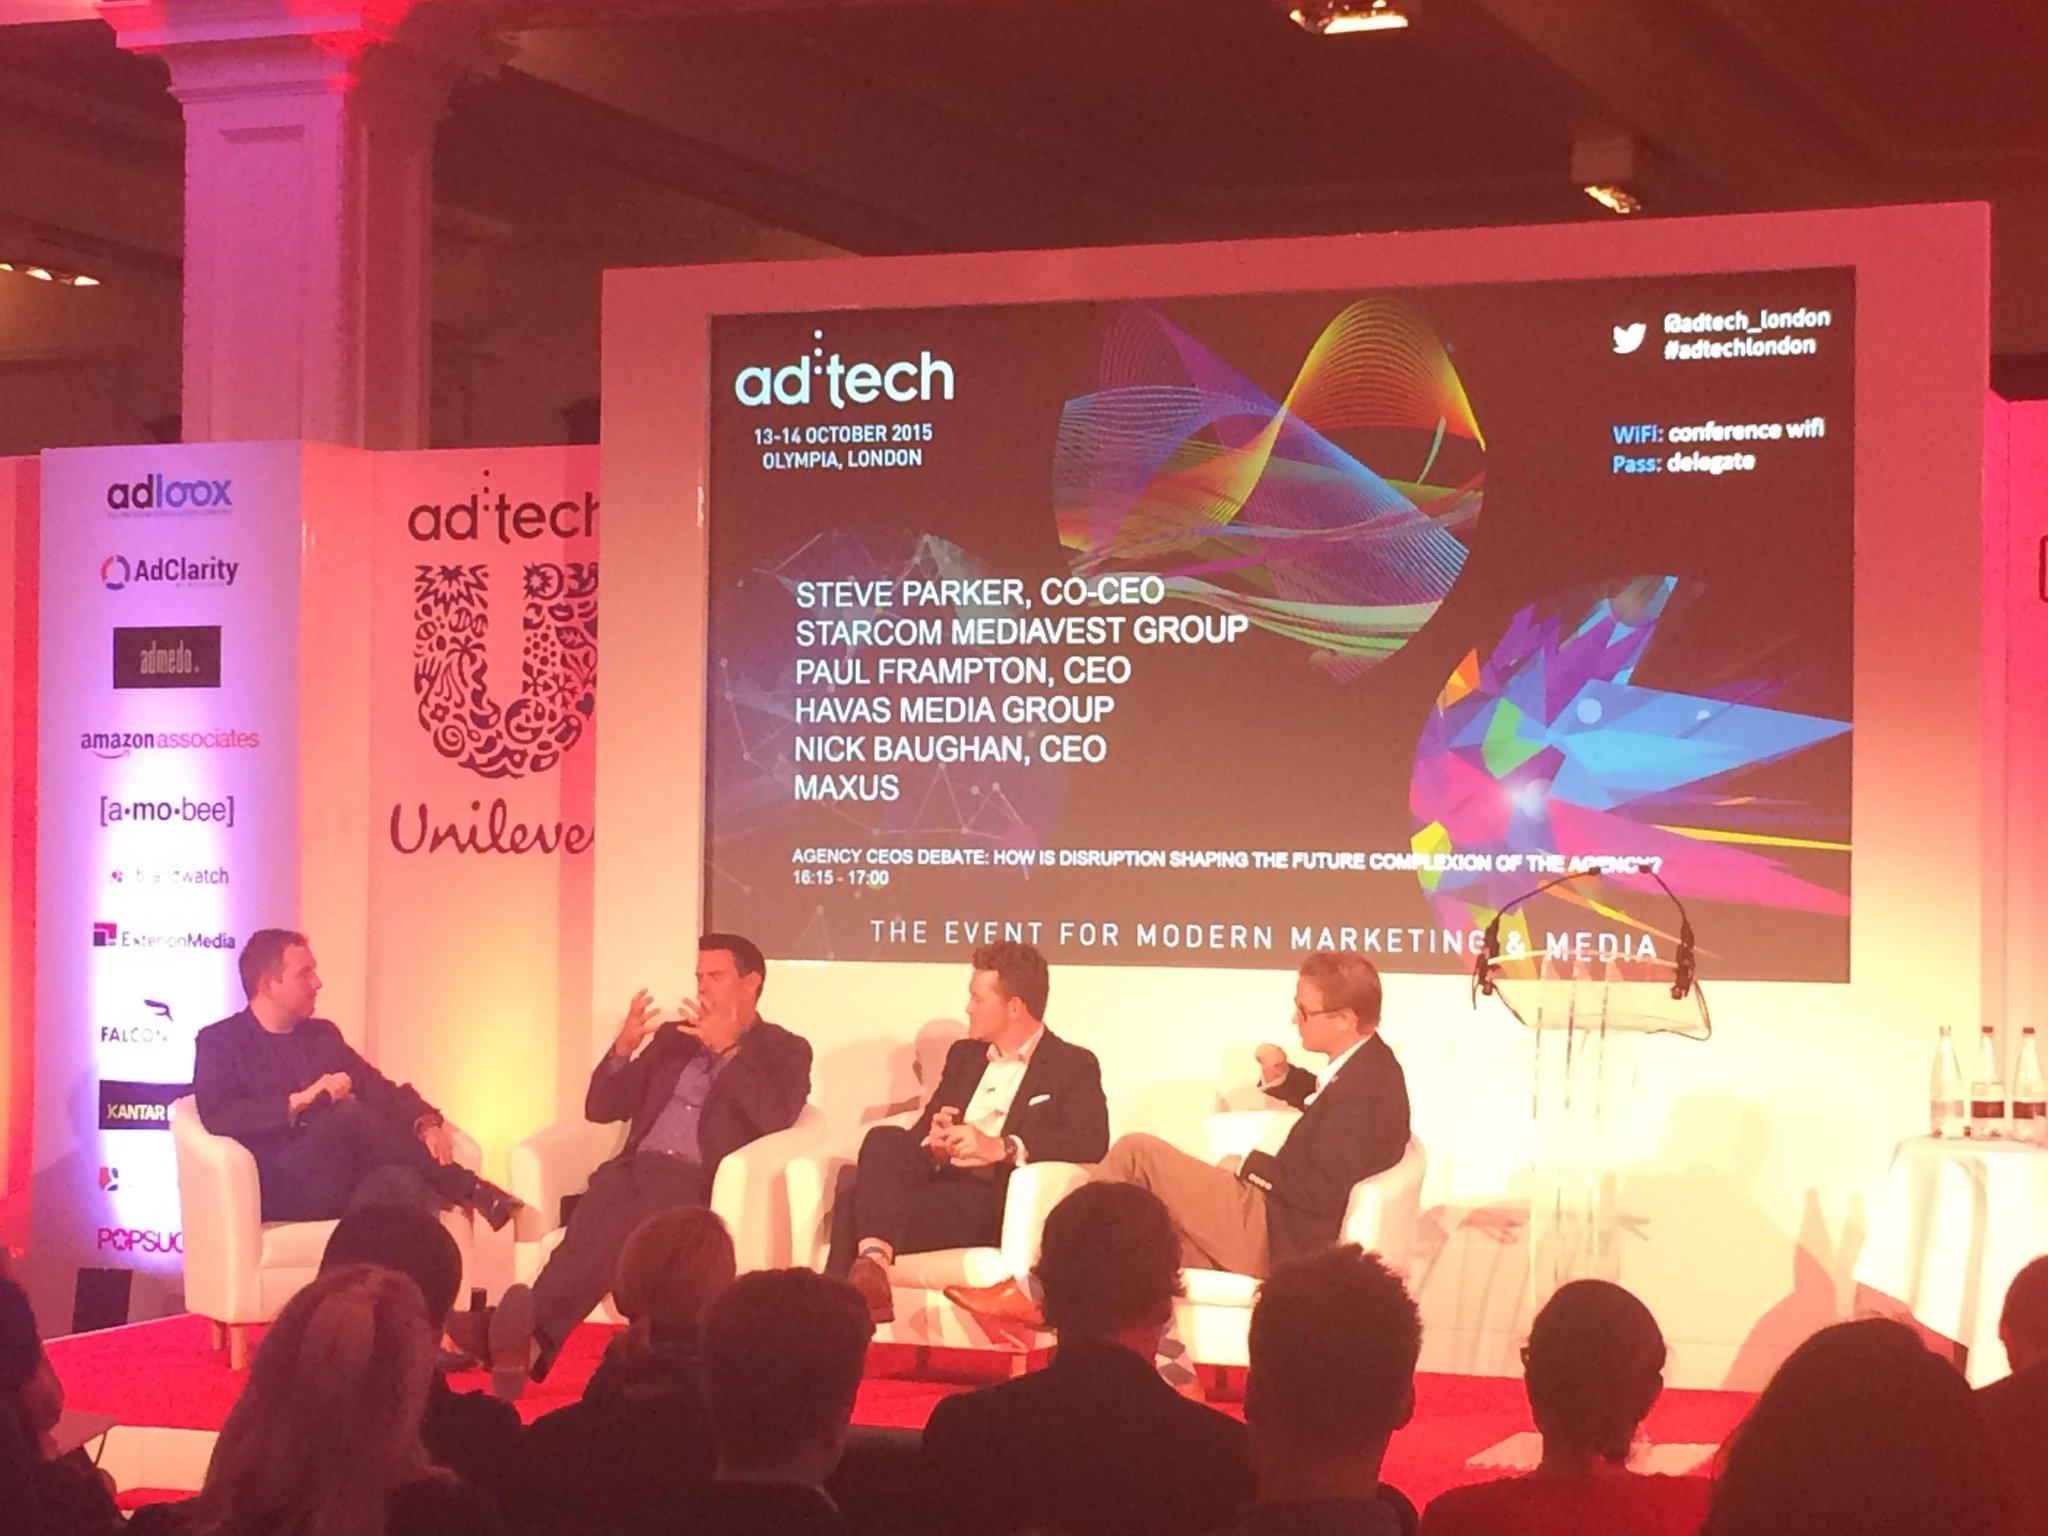 RT @propellerites: Interesting talk with @HavasMediaUK @MaxusLondon & Starcom at #adtechLondon http://t.co/Lsfc8qALut